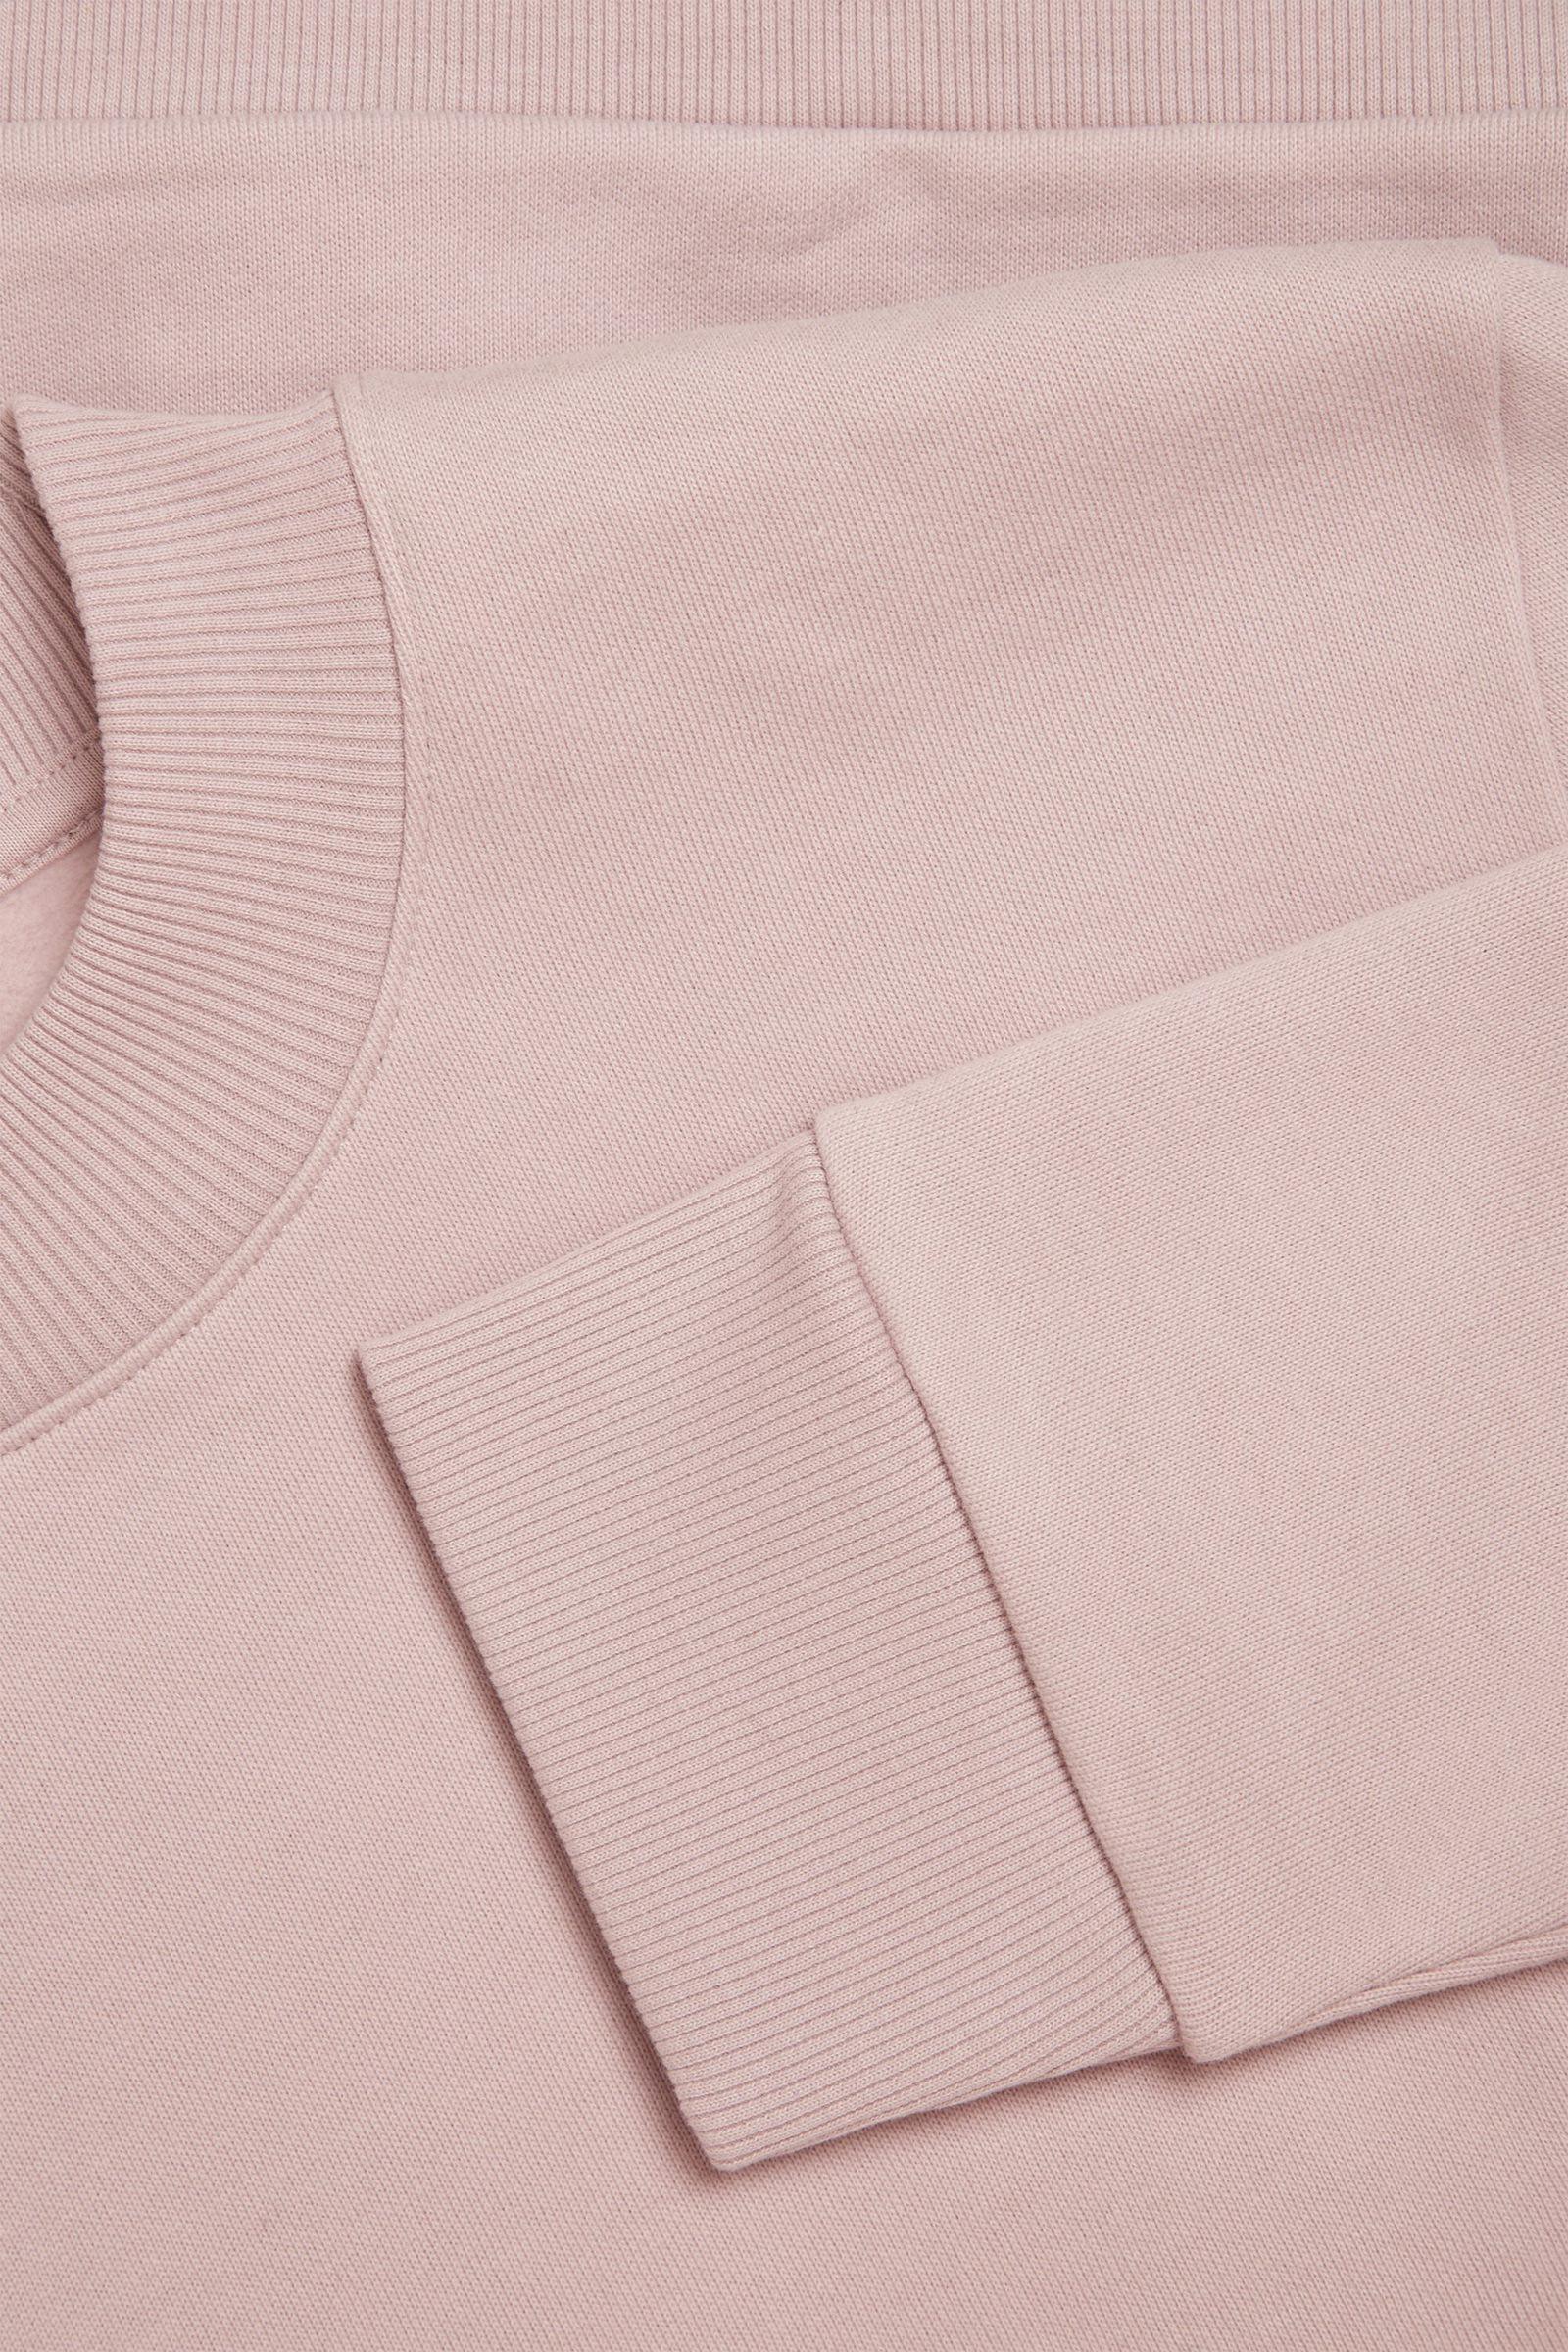 COS 코튼 스웻셔츠의 핑크컬러 Detail입니다.